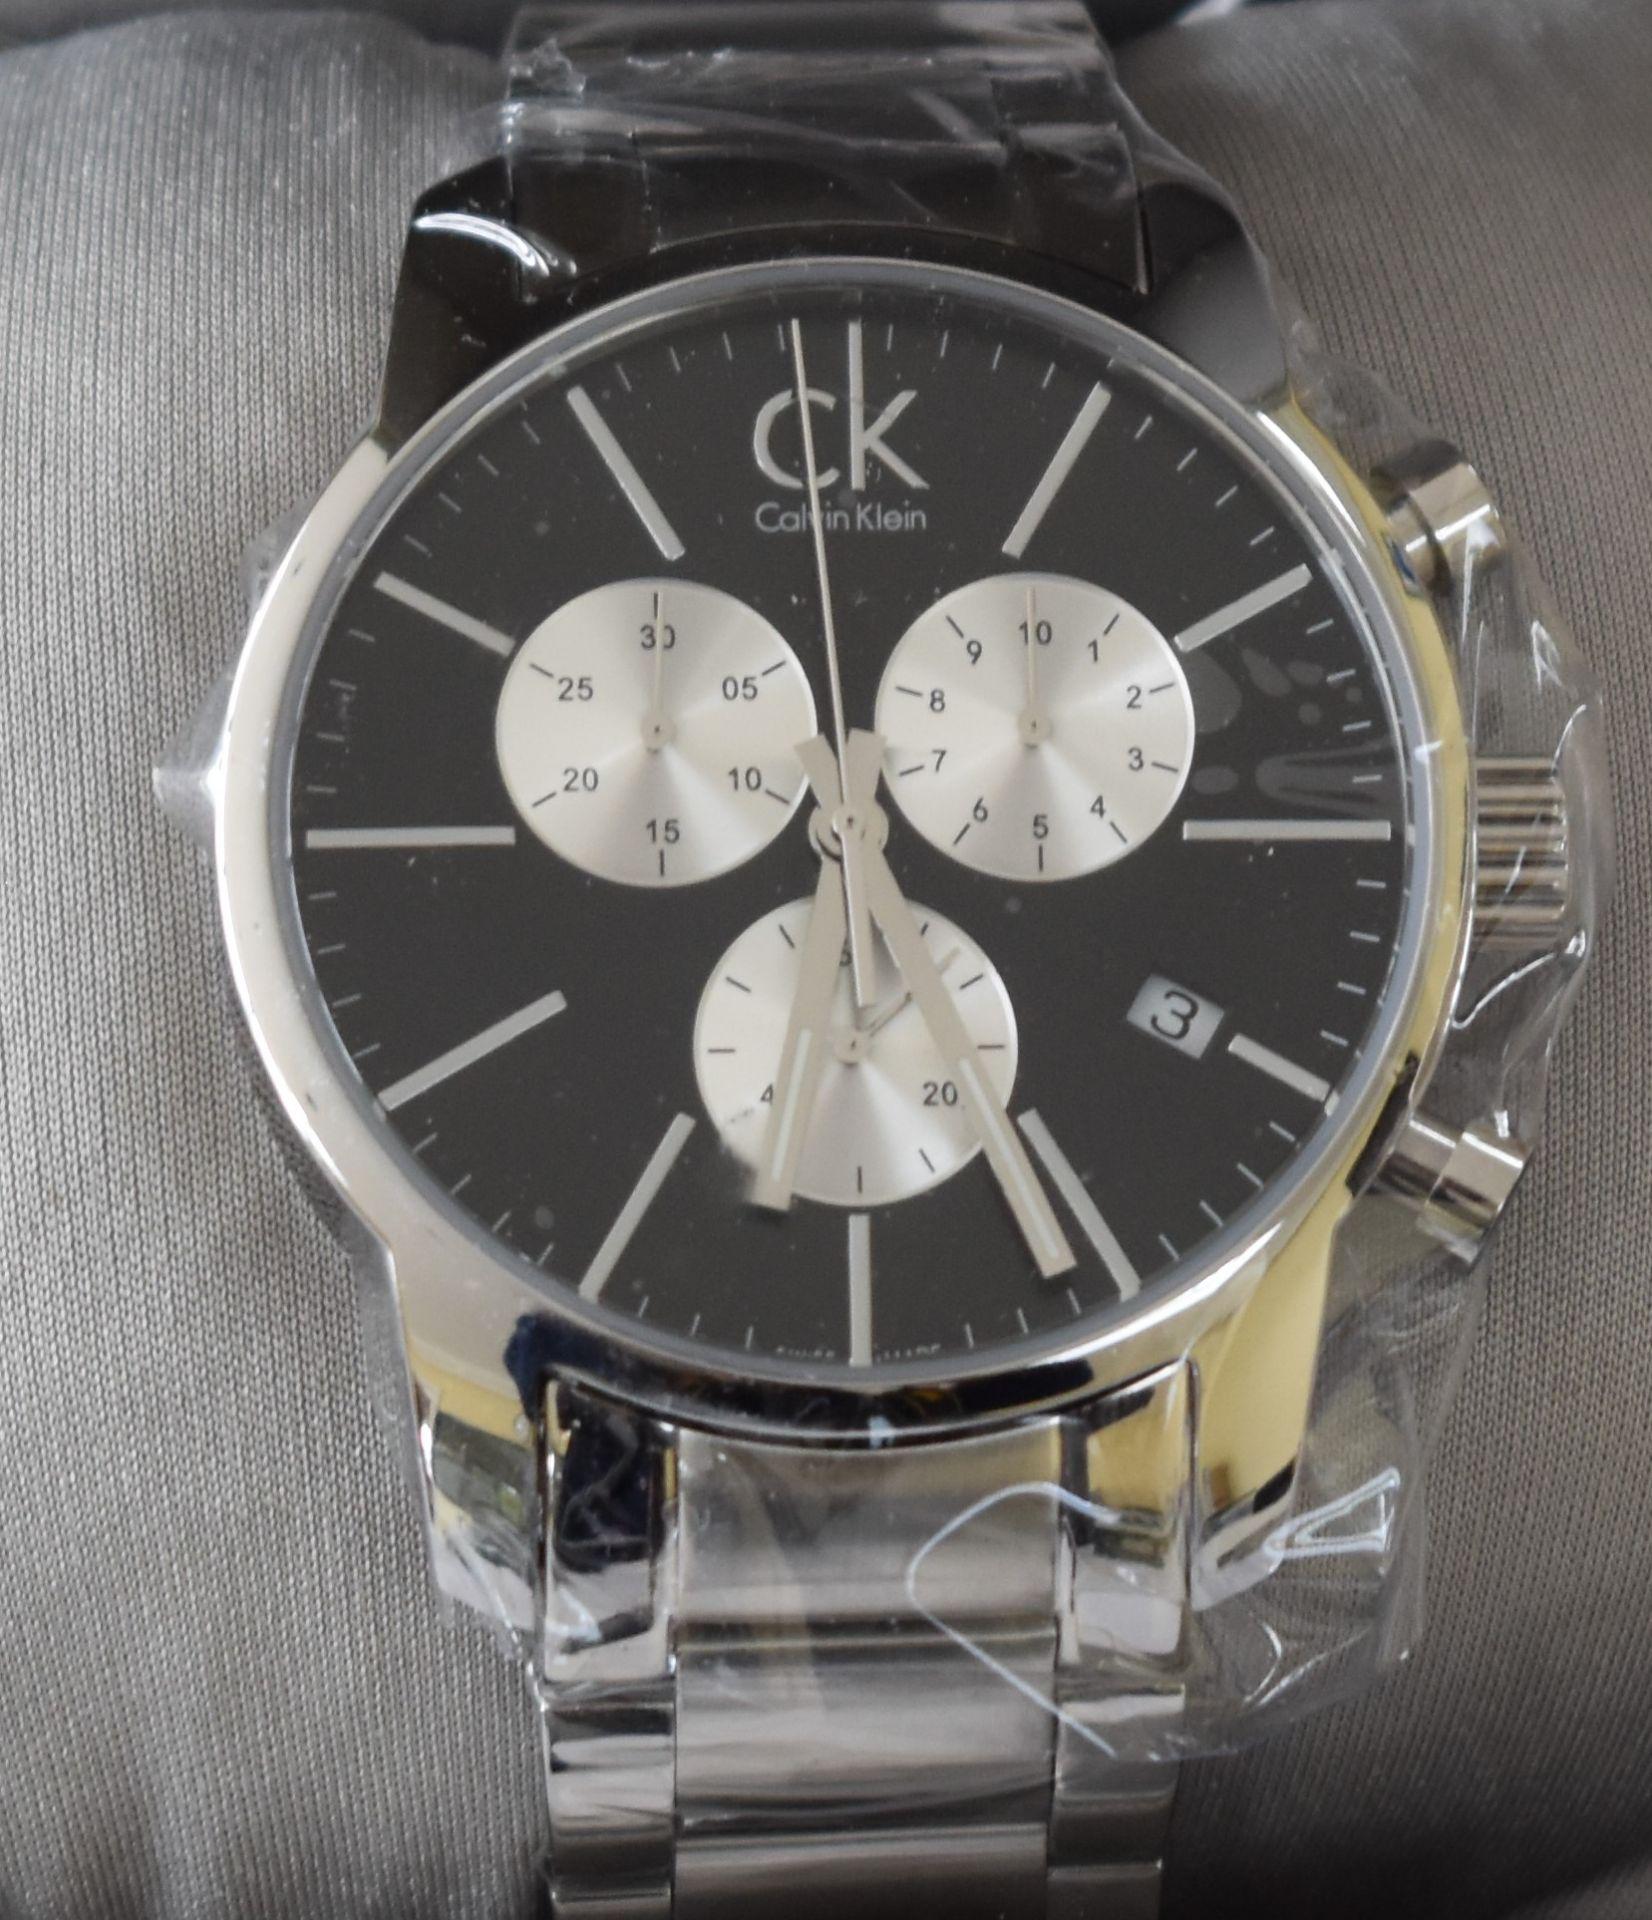 Calvin klein K2G2714X Men's Watch - Image 2 of 2